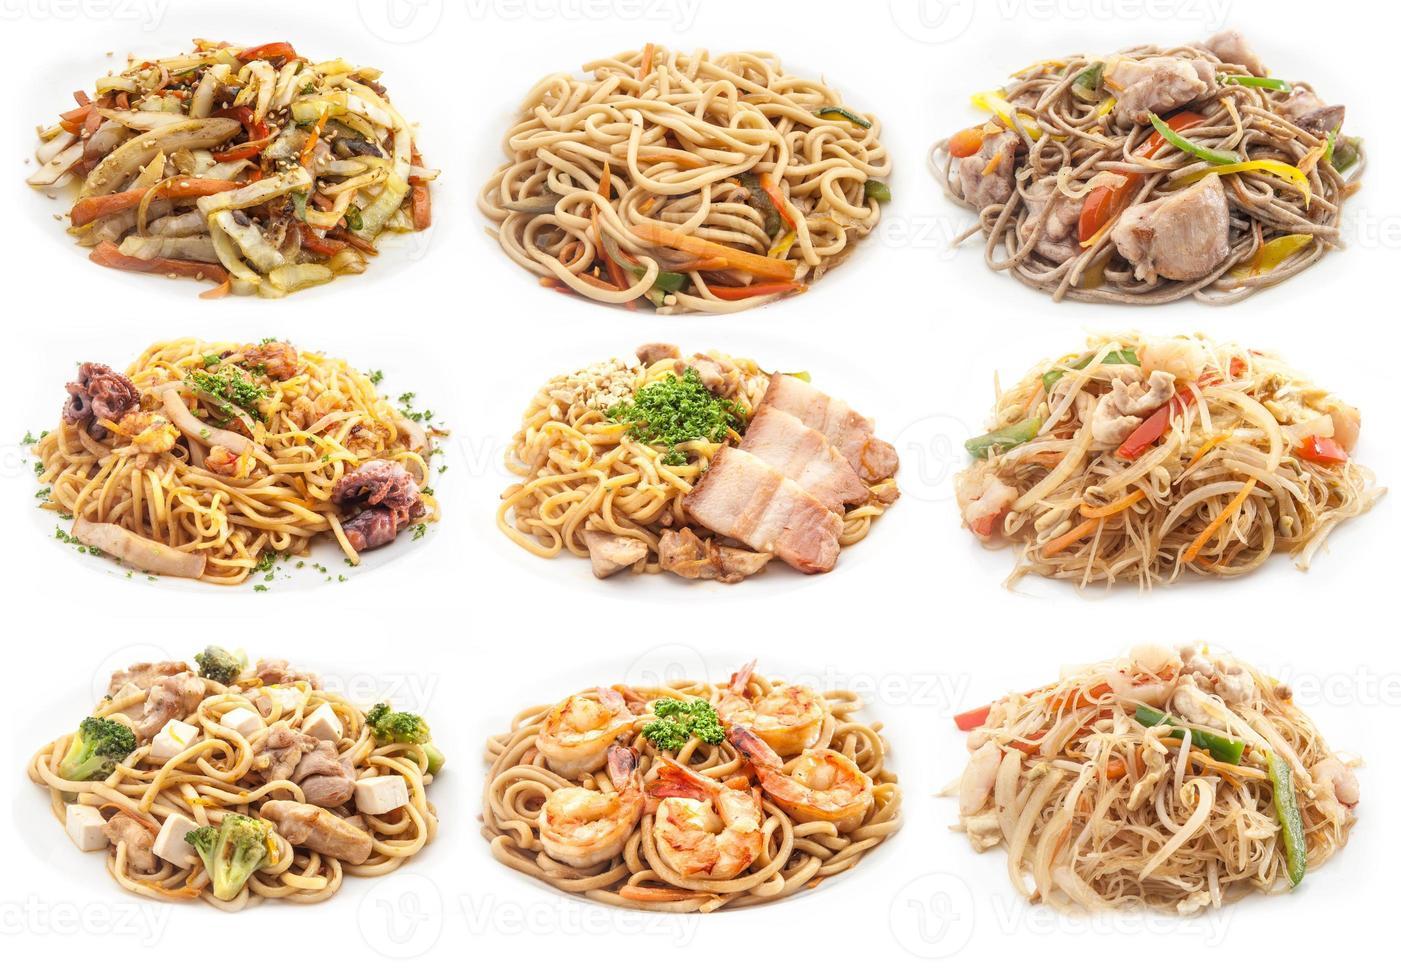 conjunto de alimentos de diferentes massas. foto